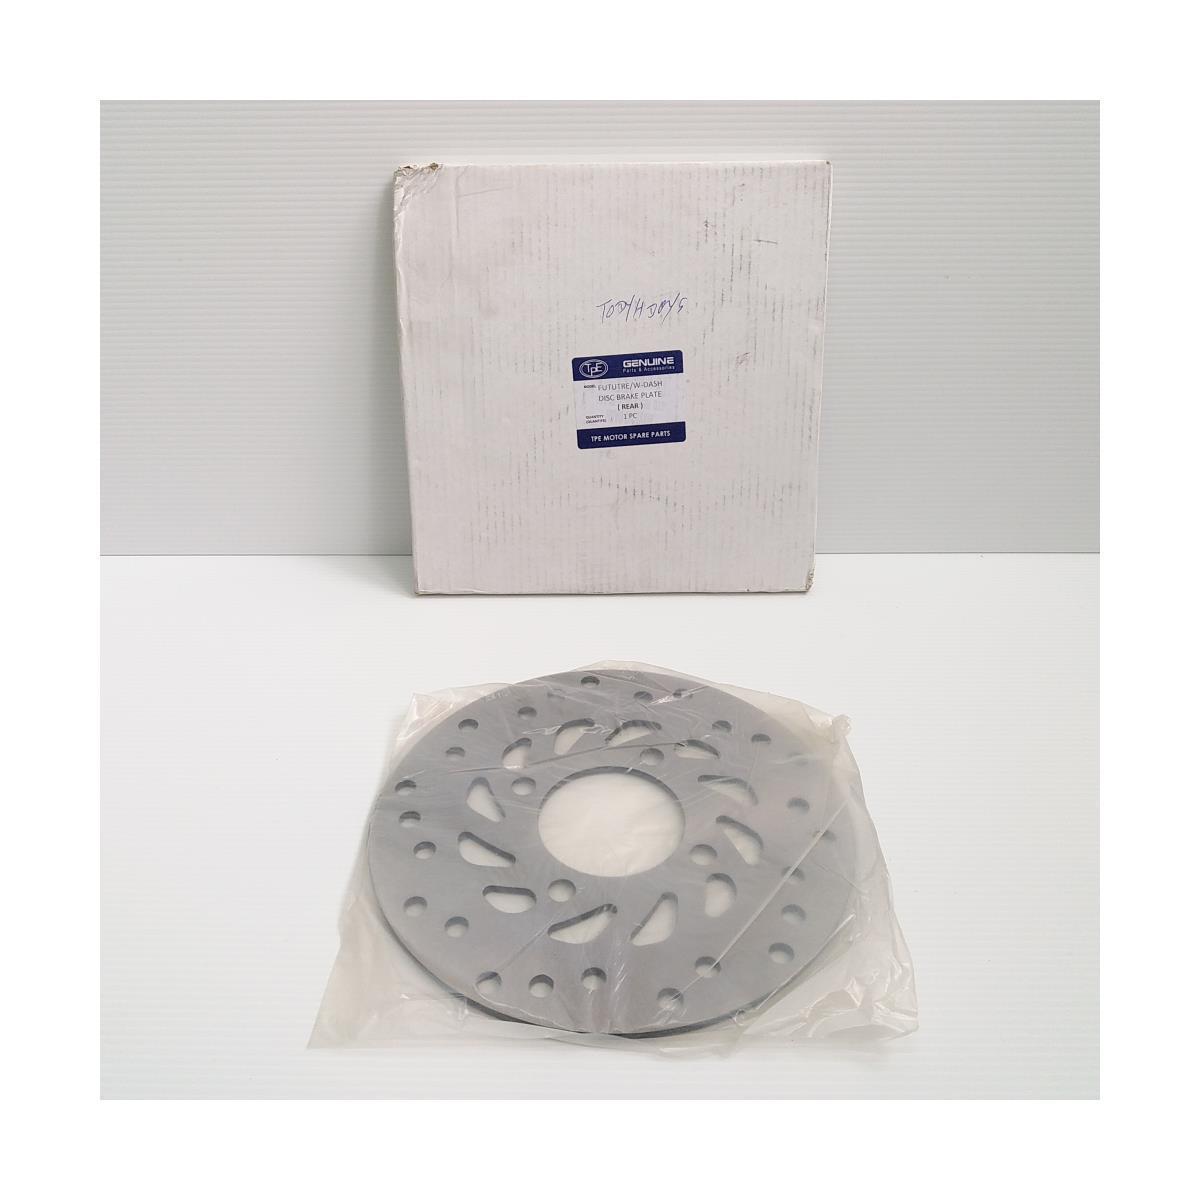 REAR DISC BRAKE PLATE FUTURE/DASH (TPE)